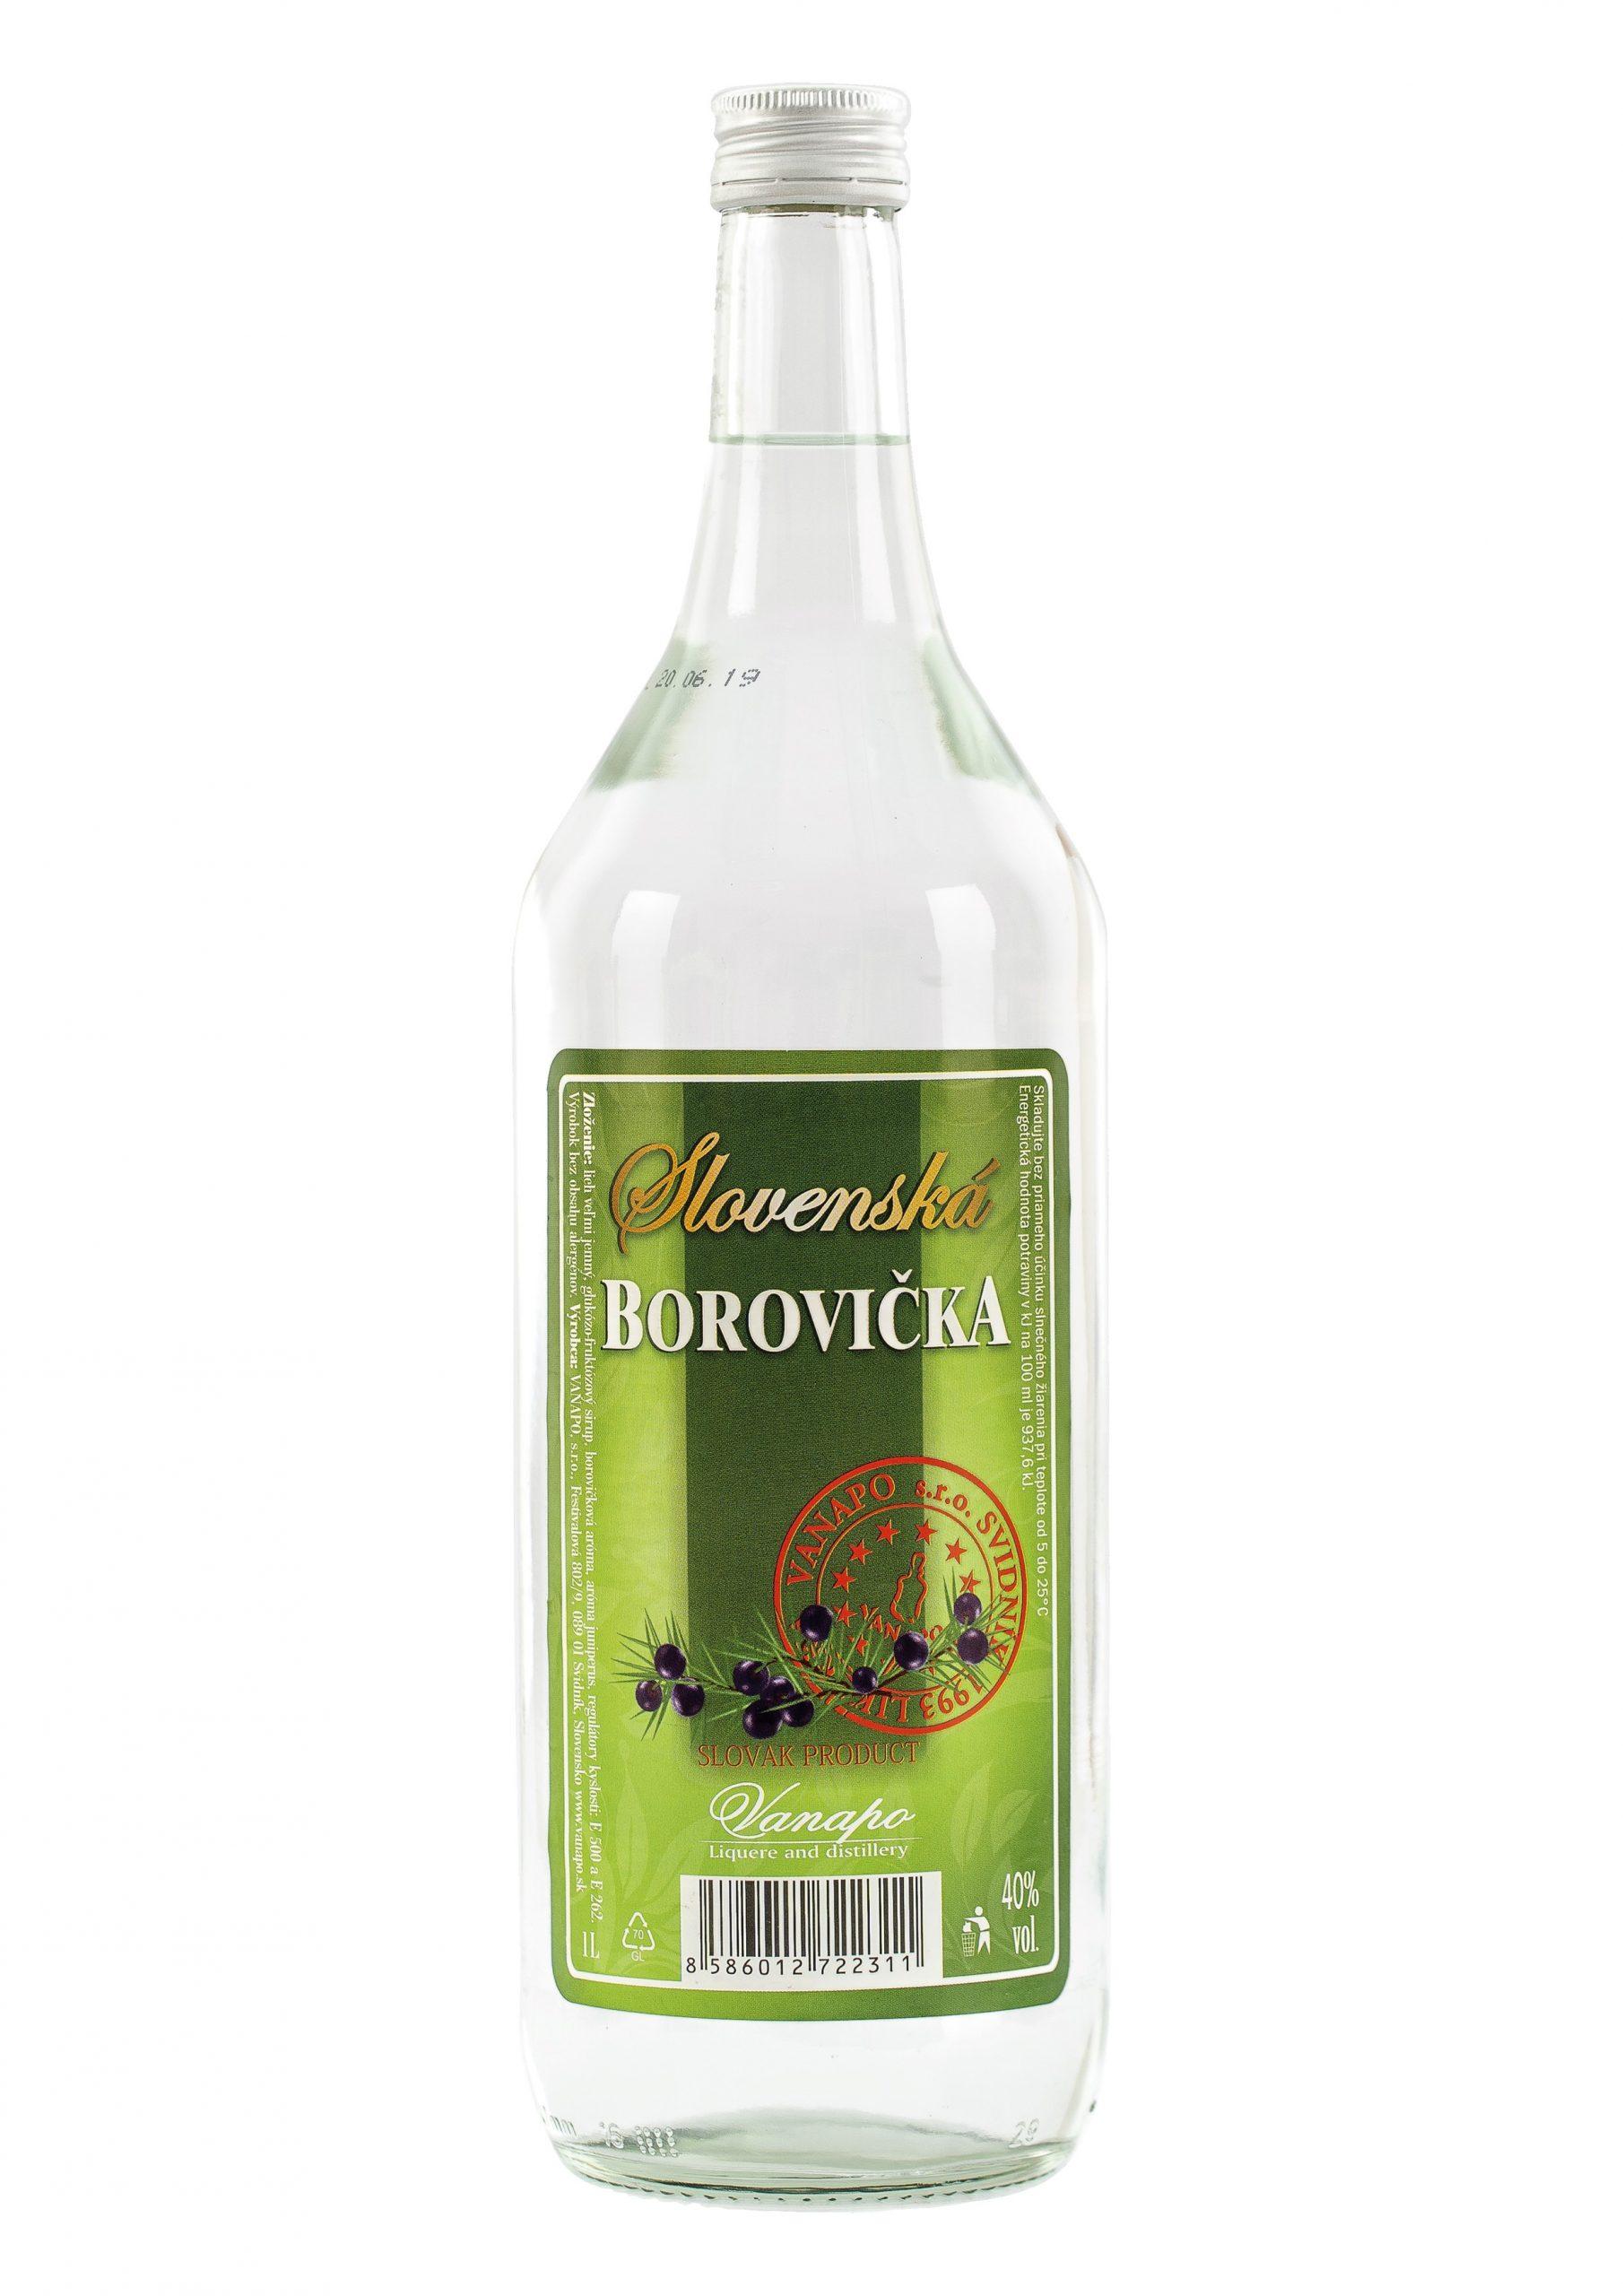 Borovicka Slovenska 40 1L scaled 1 - Slovenská borovička